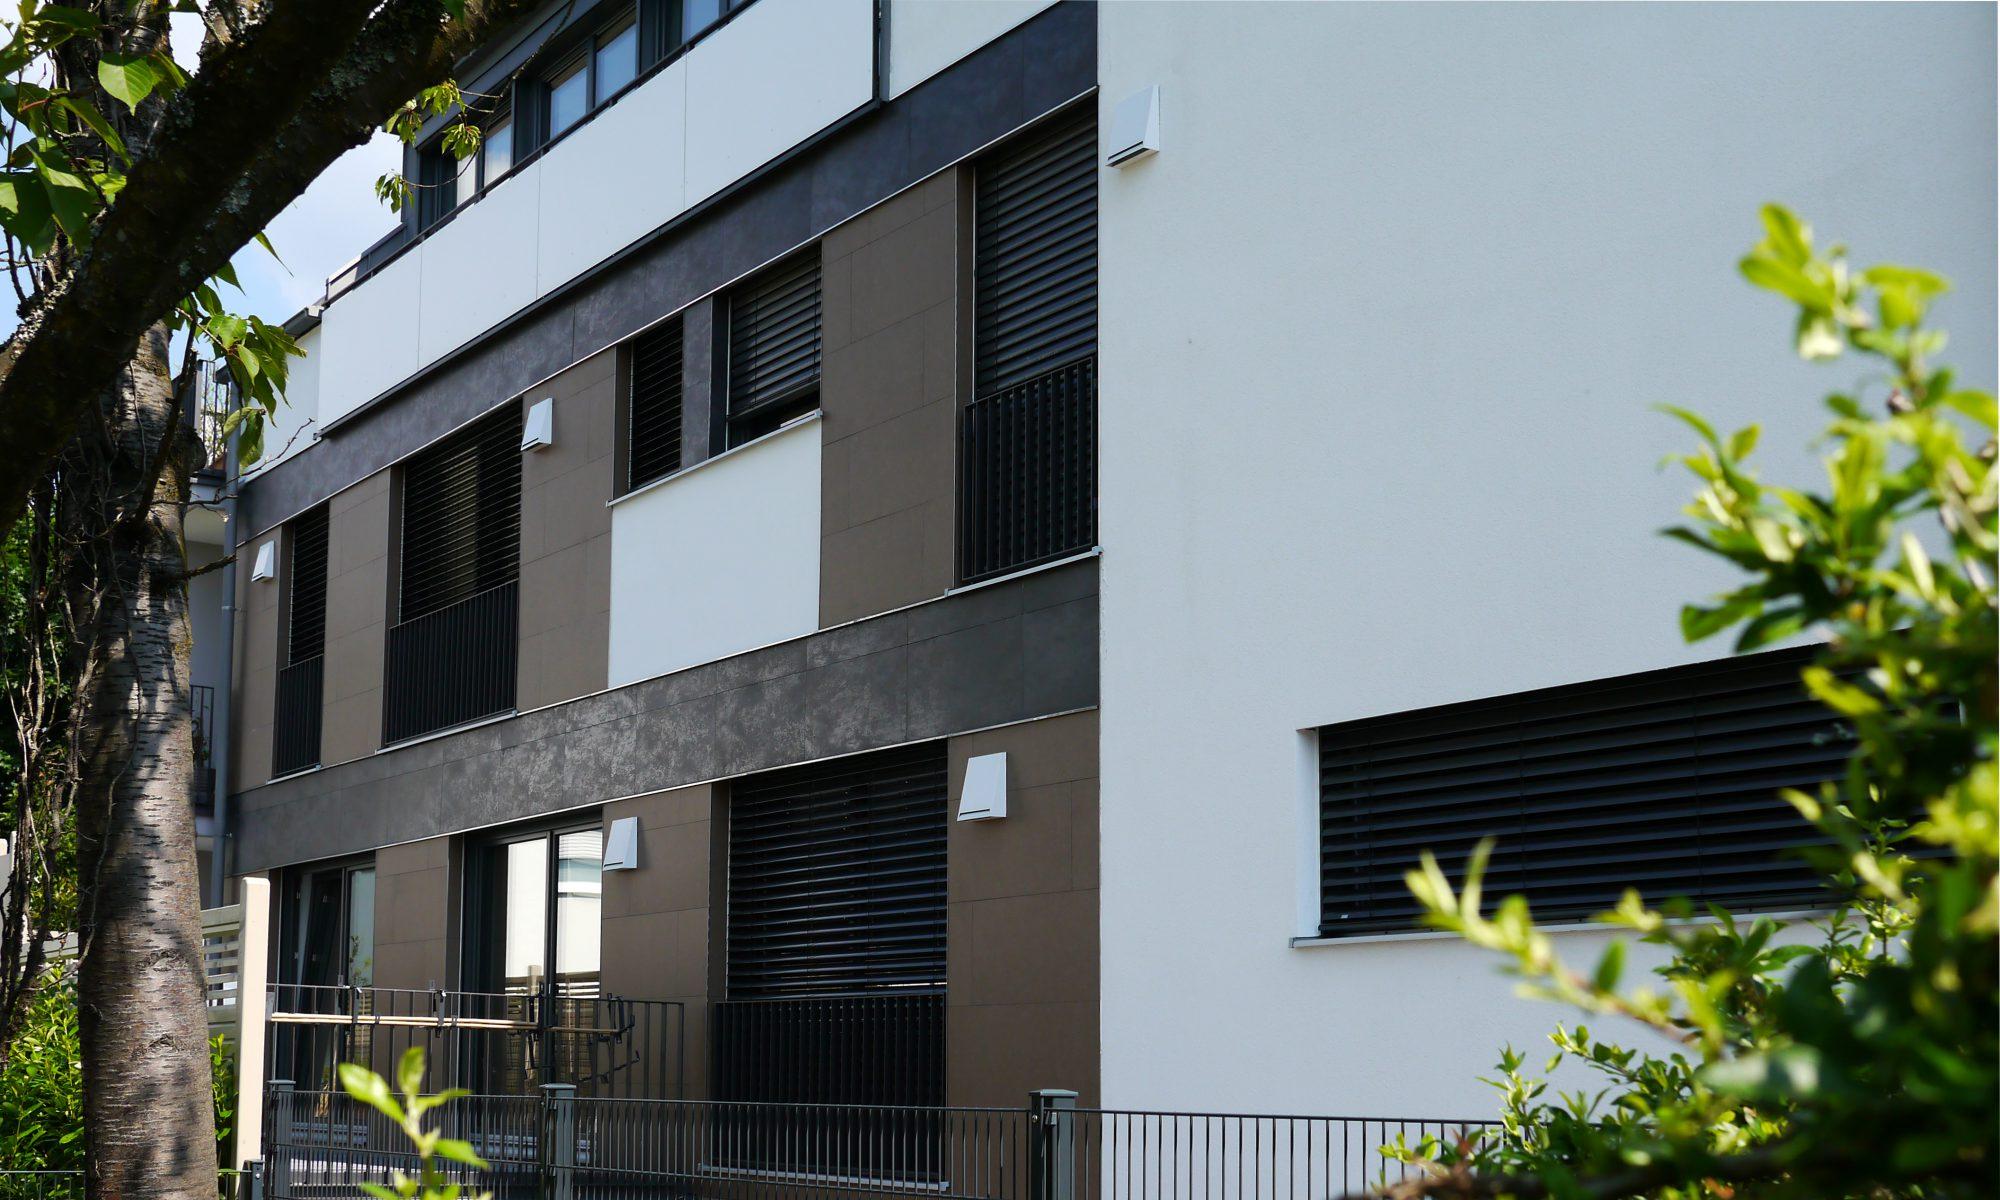 KfW Wiesbaden, inVENTer